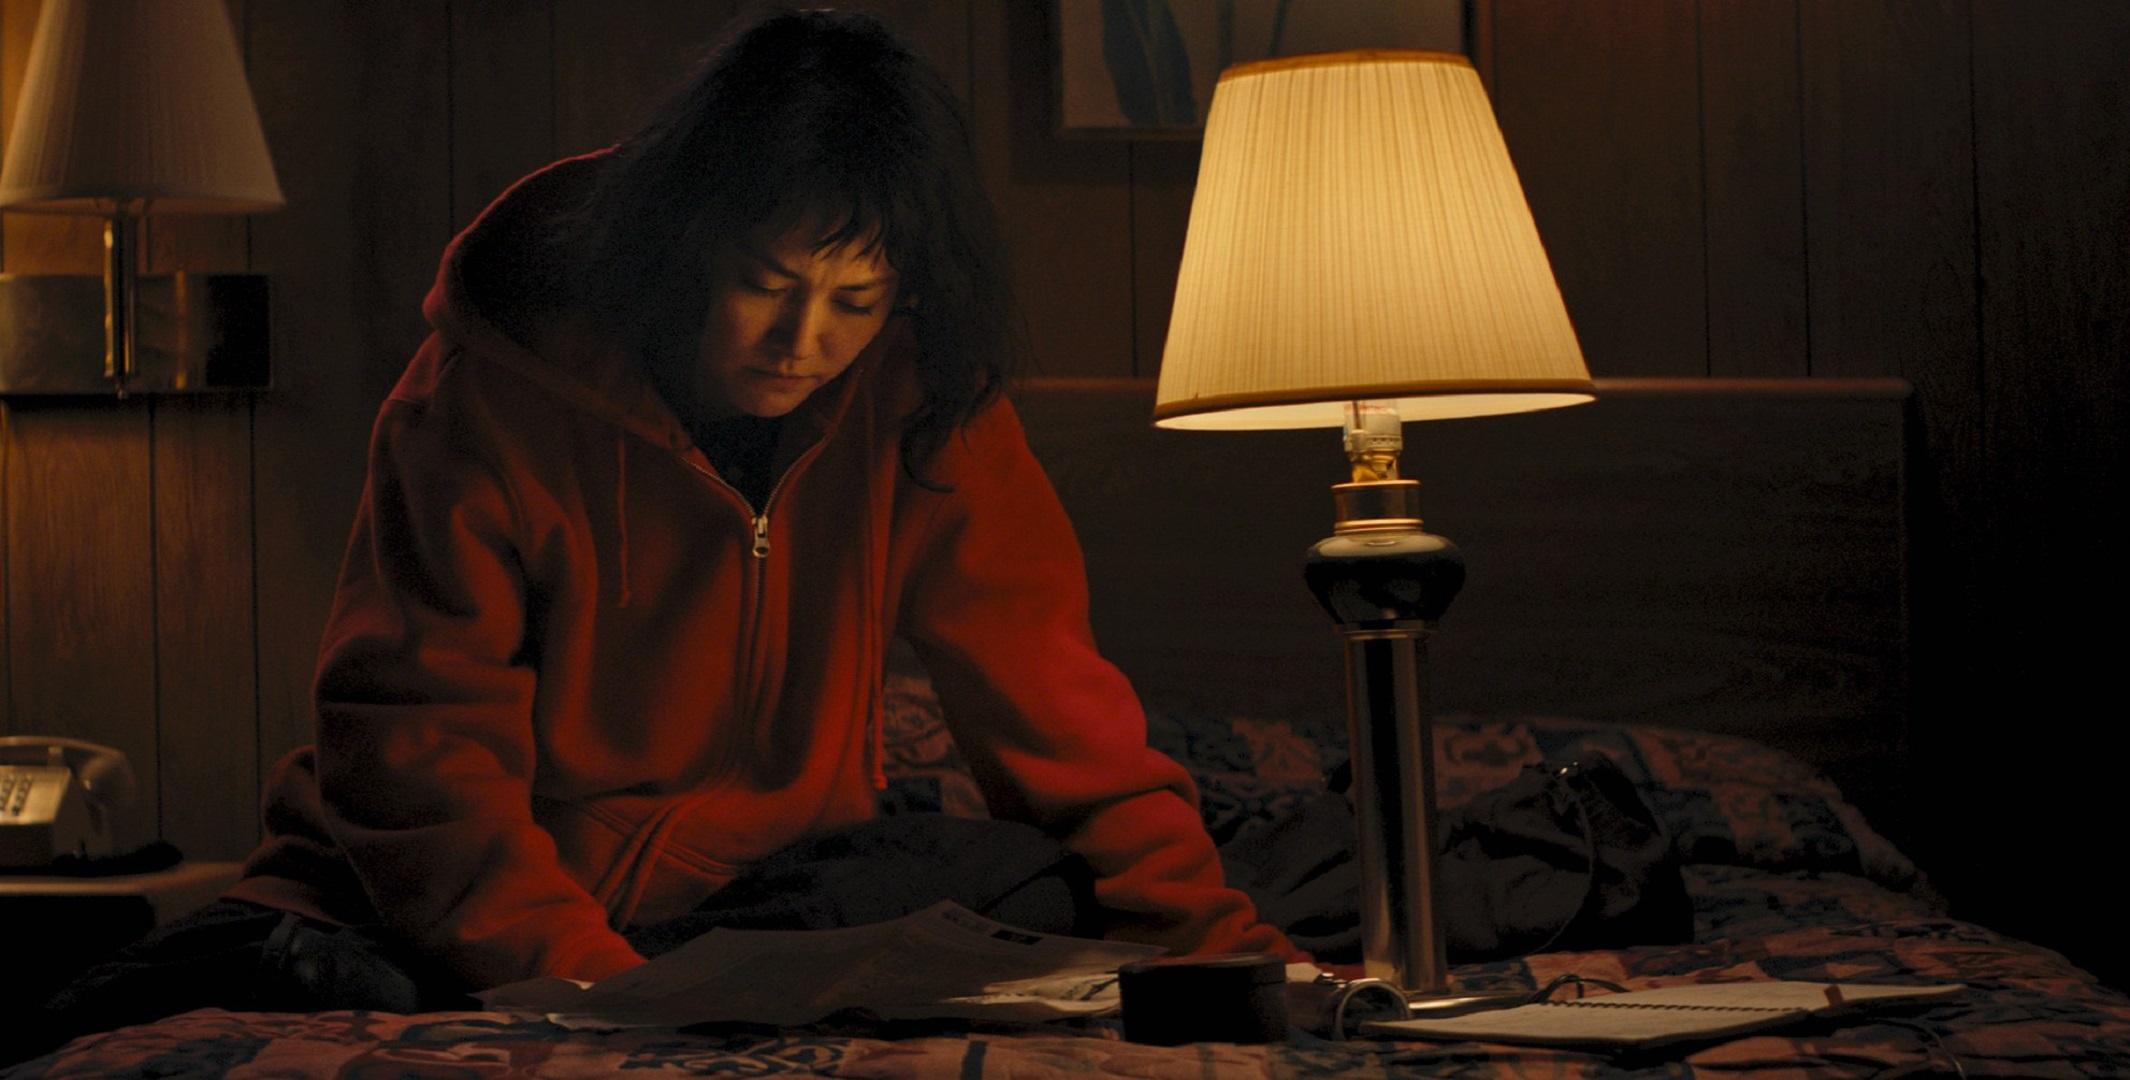 Rinko Kikuchi High Definition Wallpapers